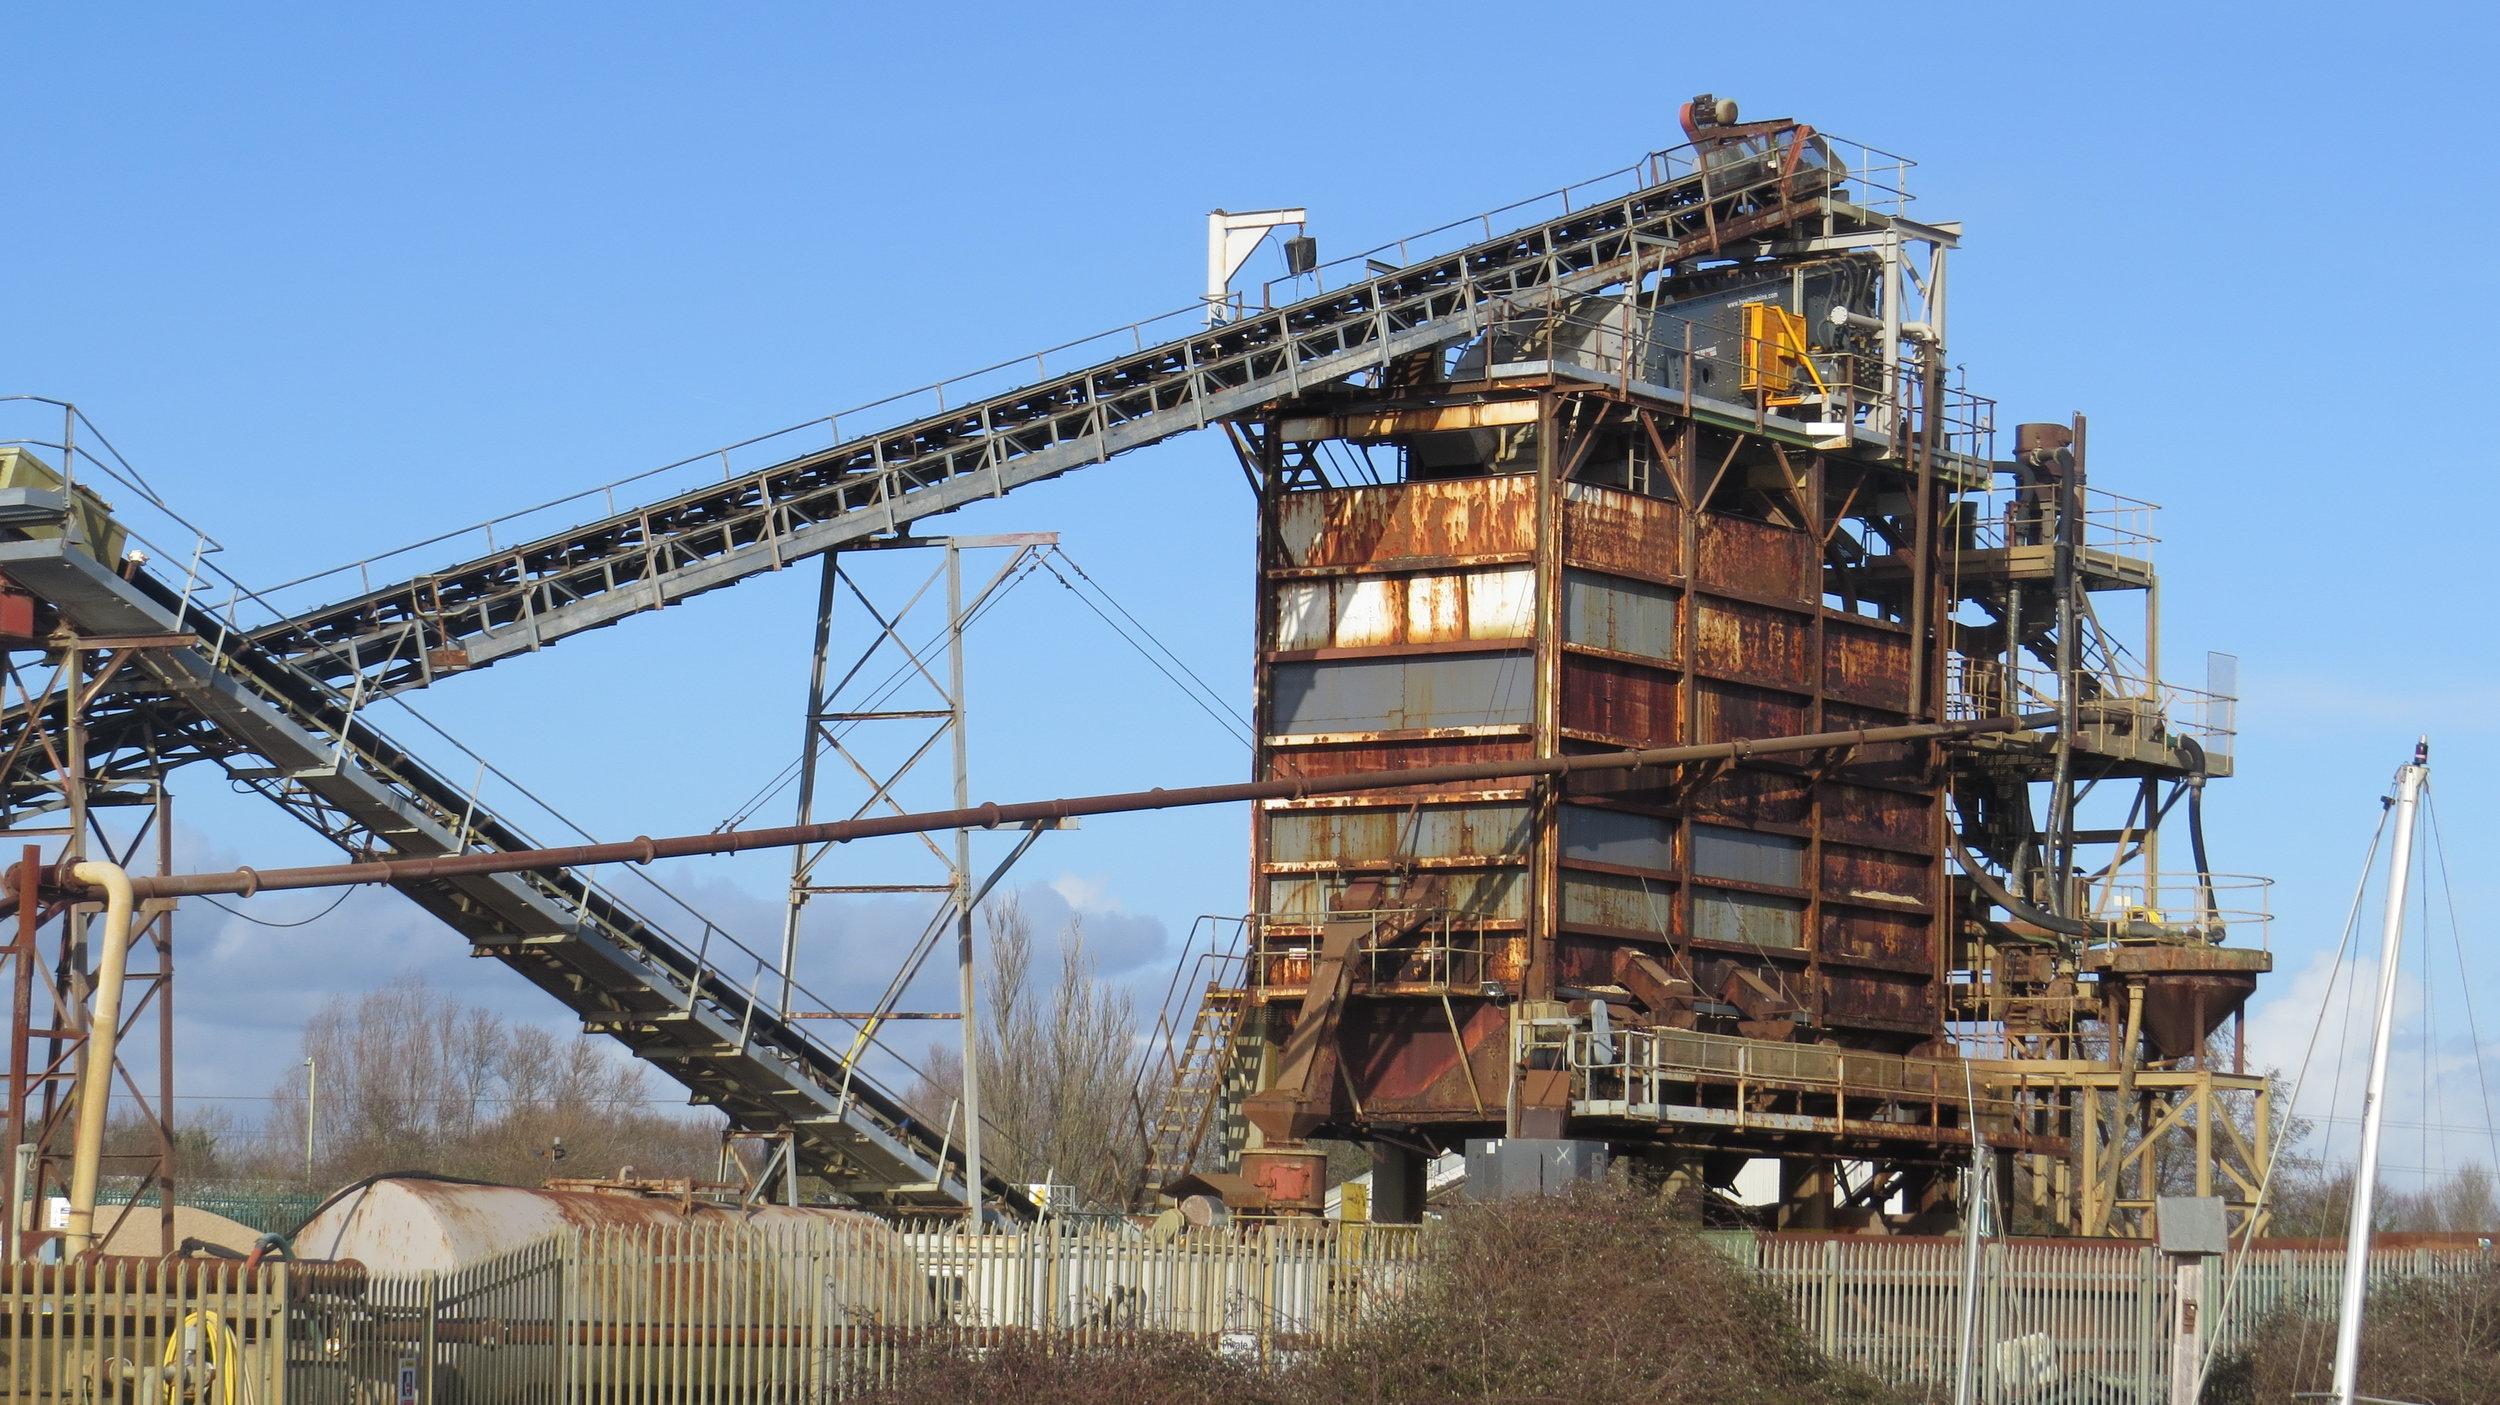 Rusty Works